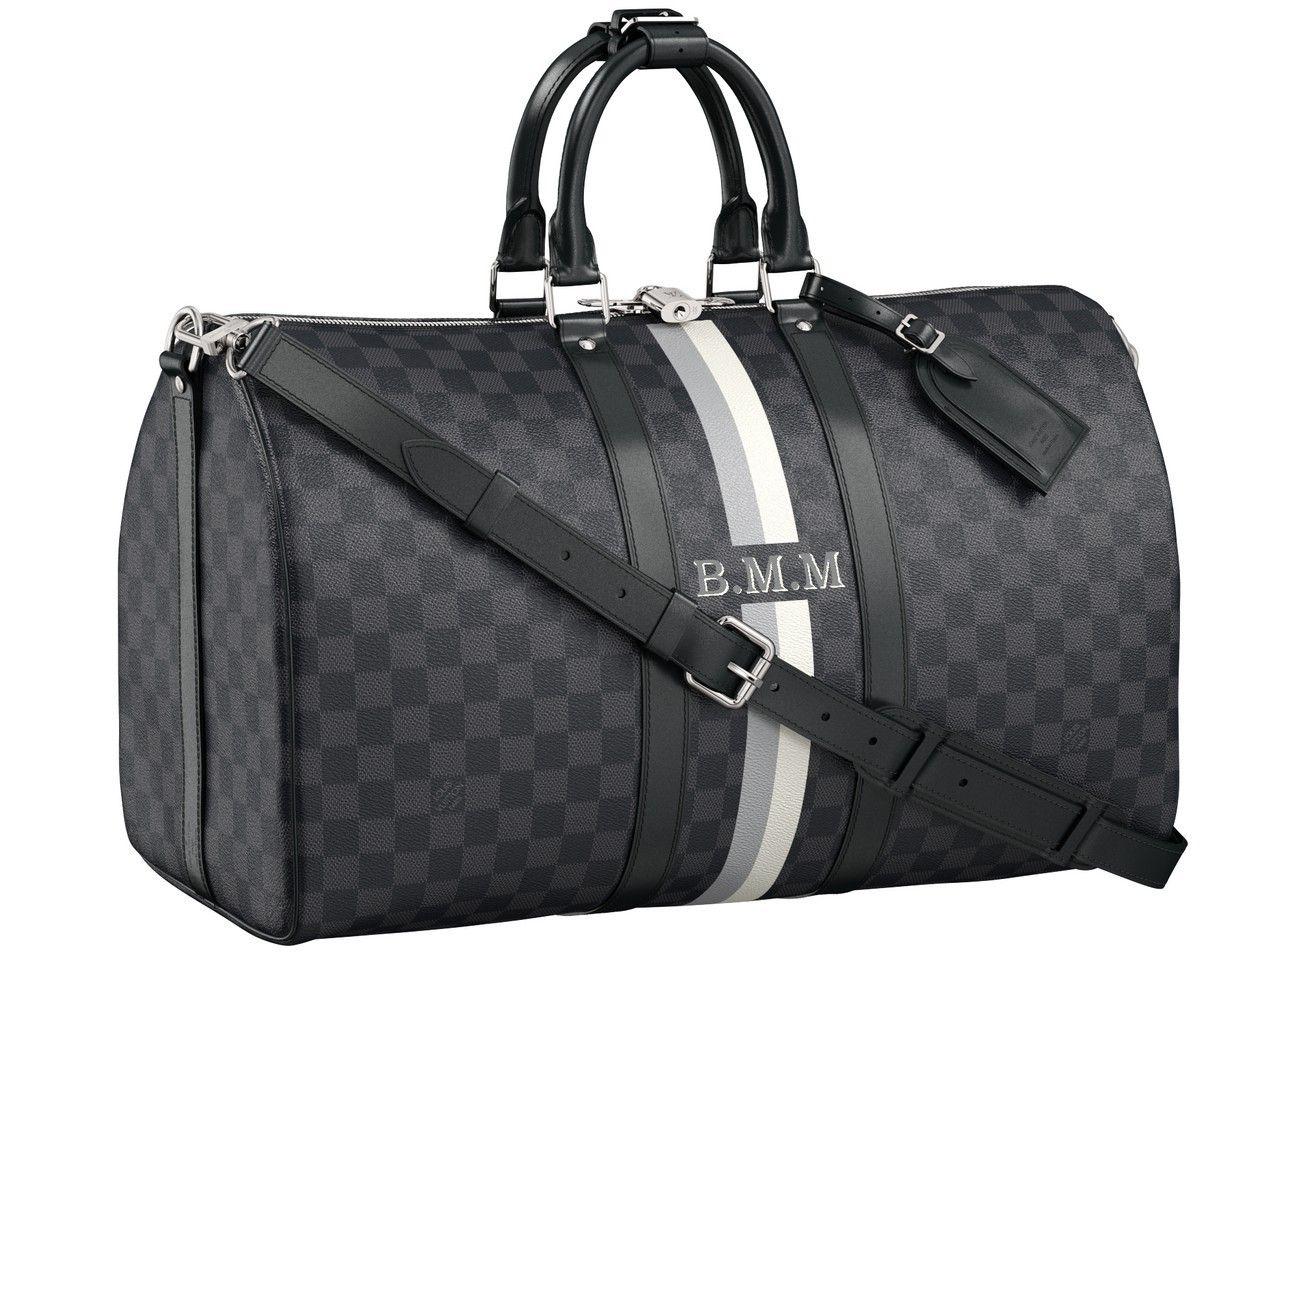 7a8a779878 Keepall Bandouliere 45 Mon Damier Graphite in 2019 | Louis Vuitton ...